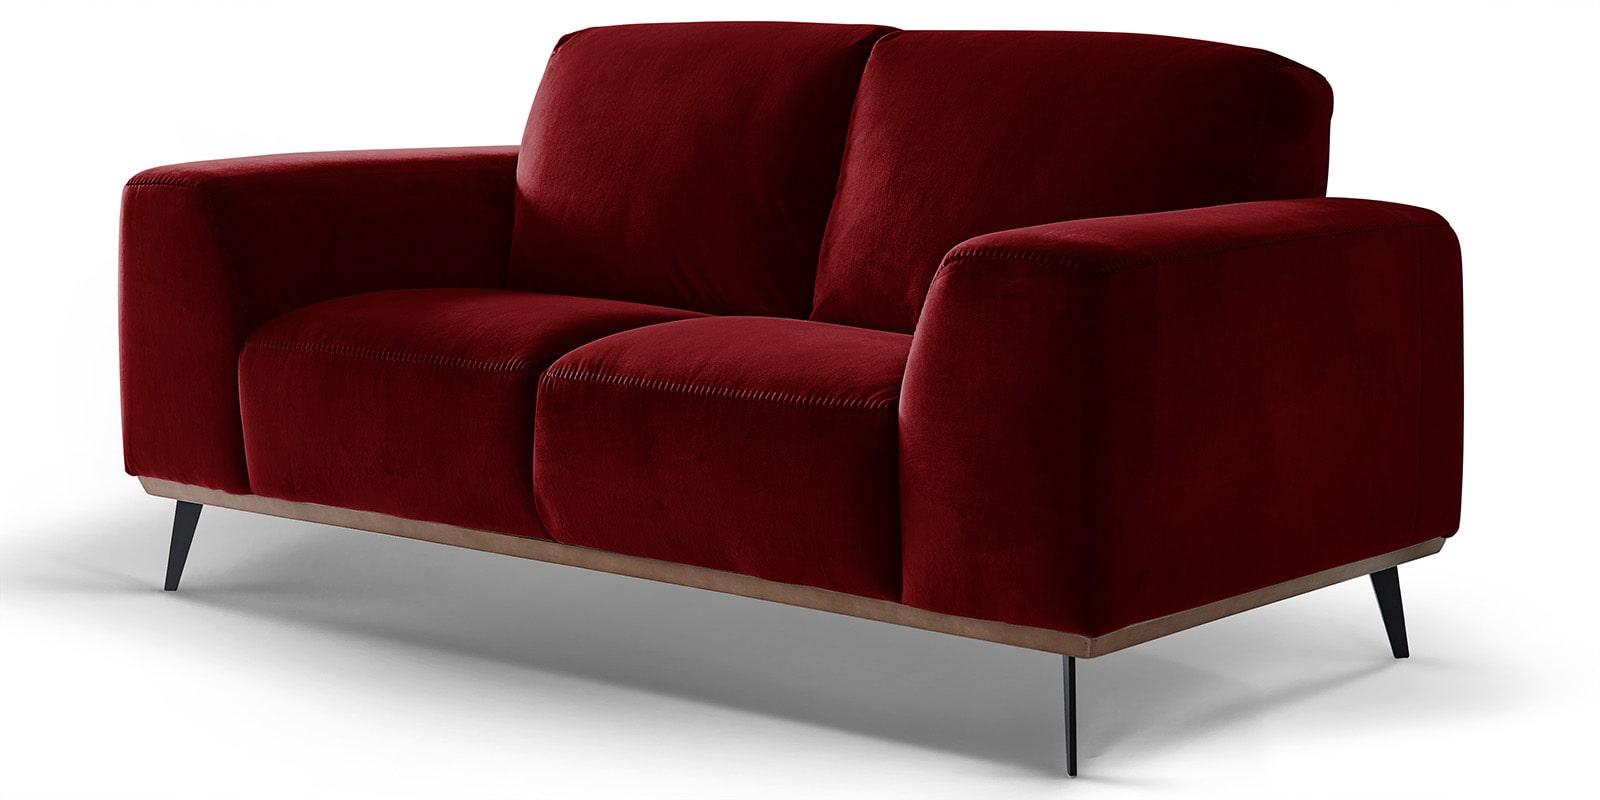 Moebella24 - 2-Sitzer - Sofa - Barcelona - Samt - Rot - Skandinavisches - Design - Punto - cavallo - Nähte - Detailaufnahme